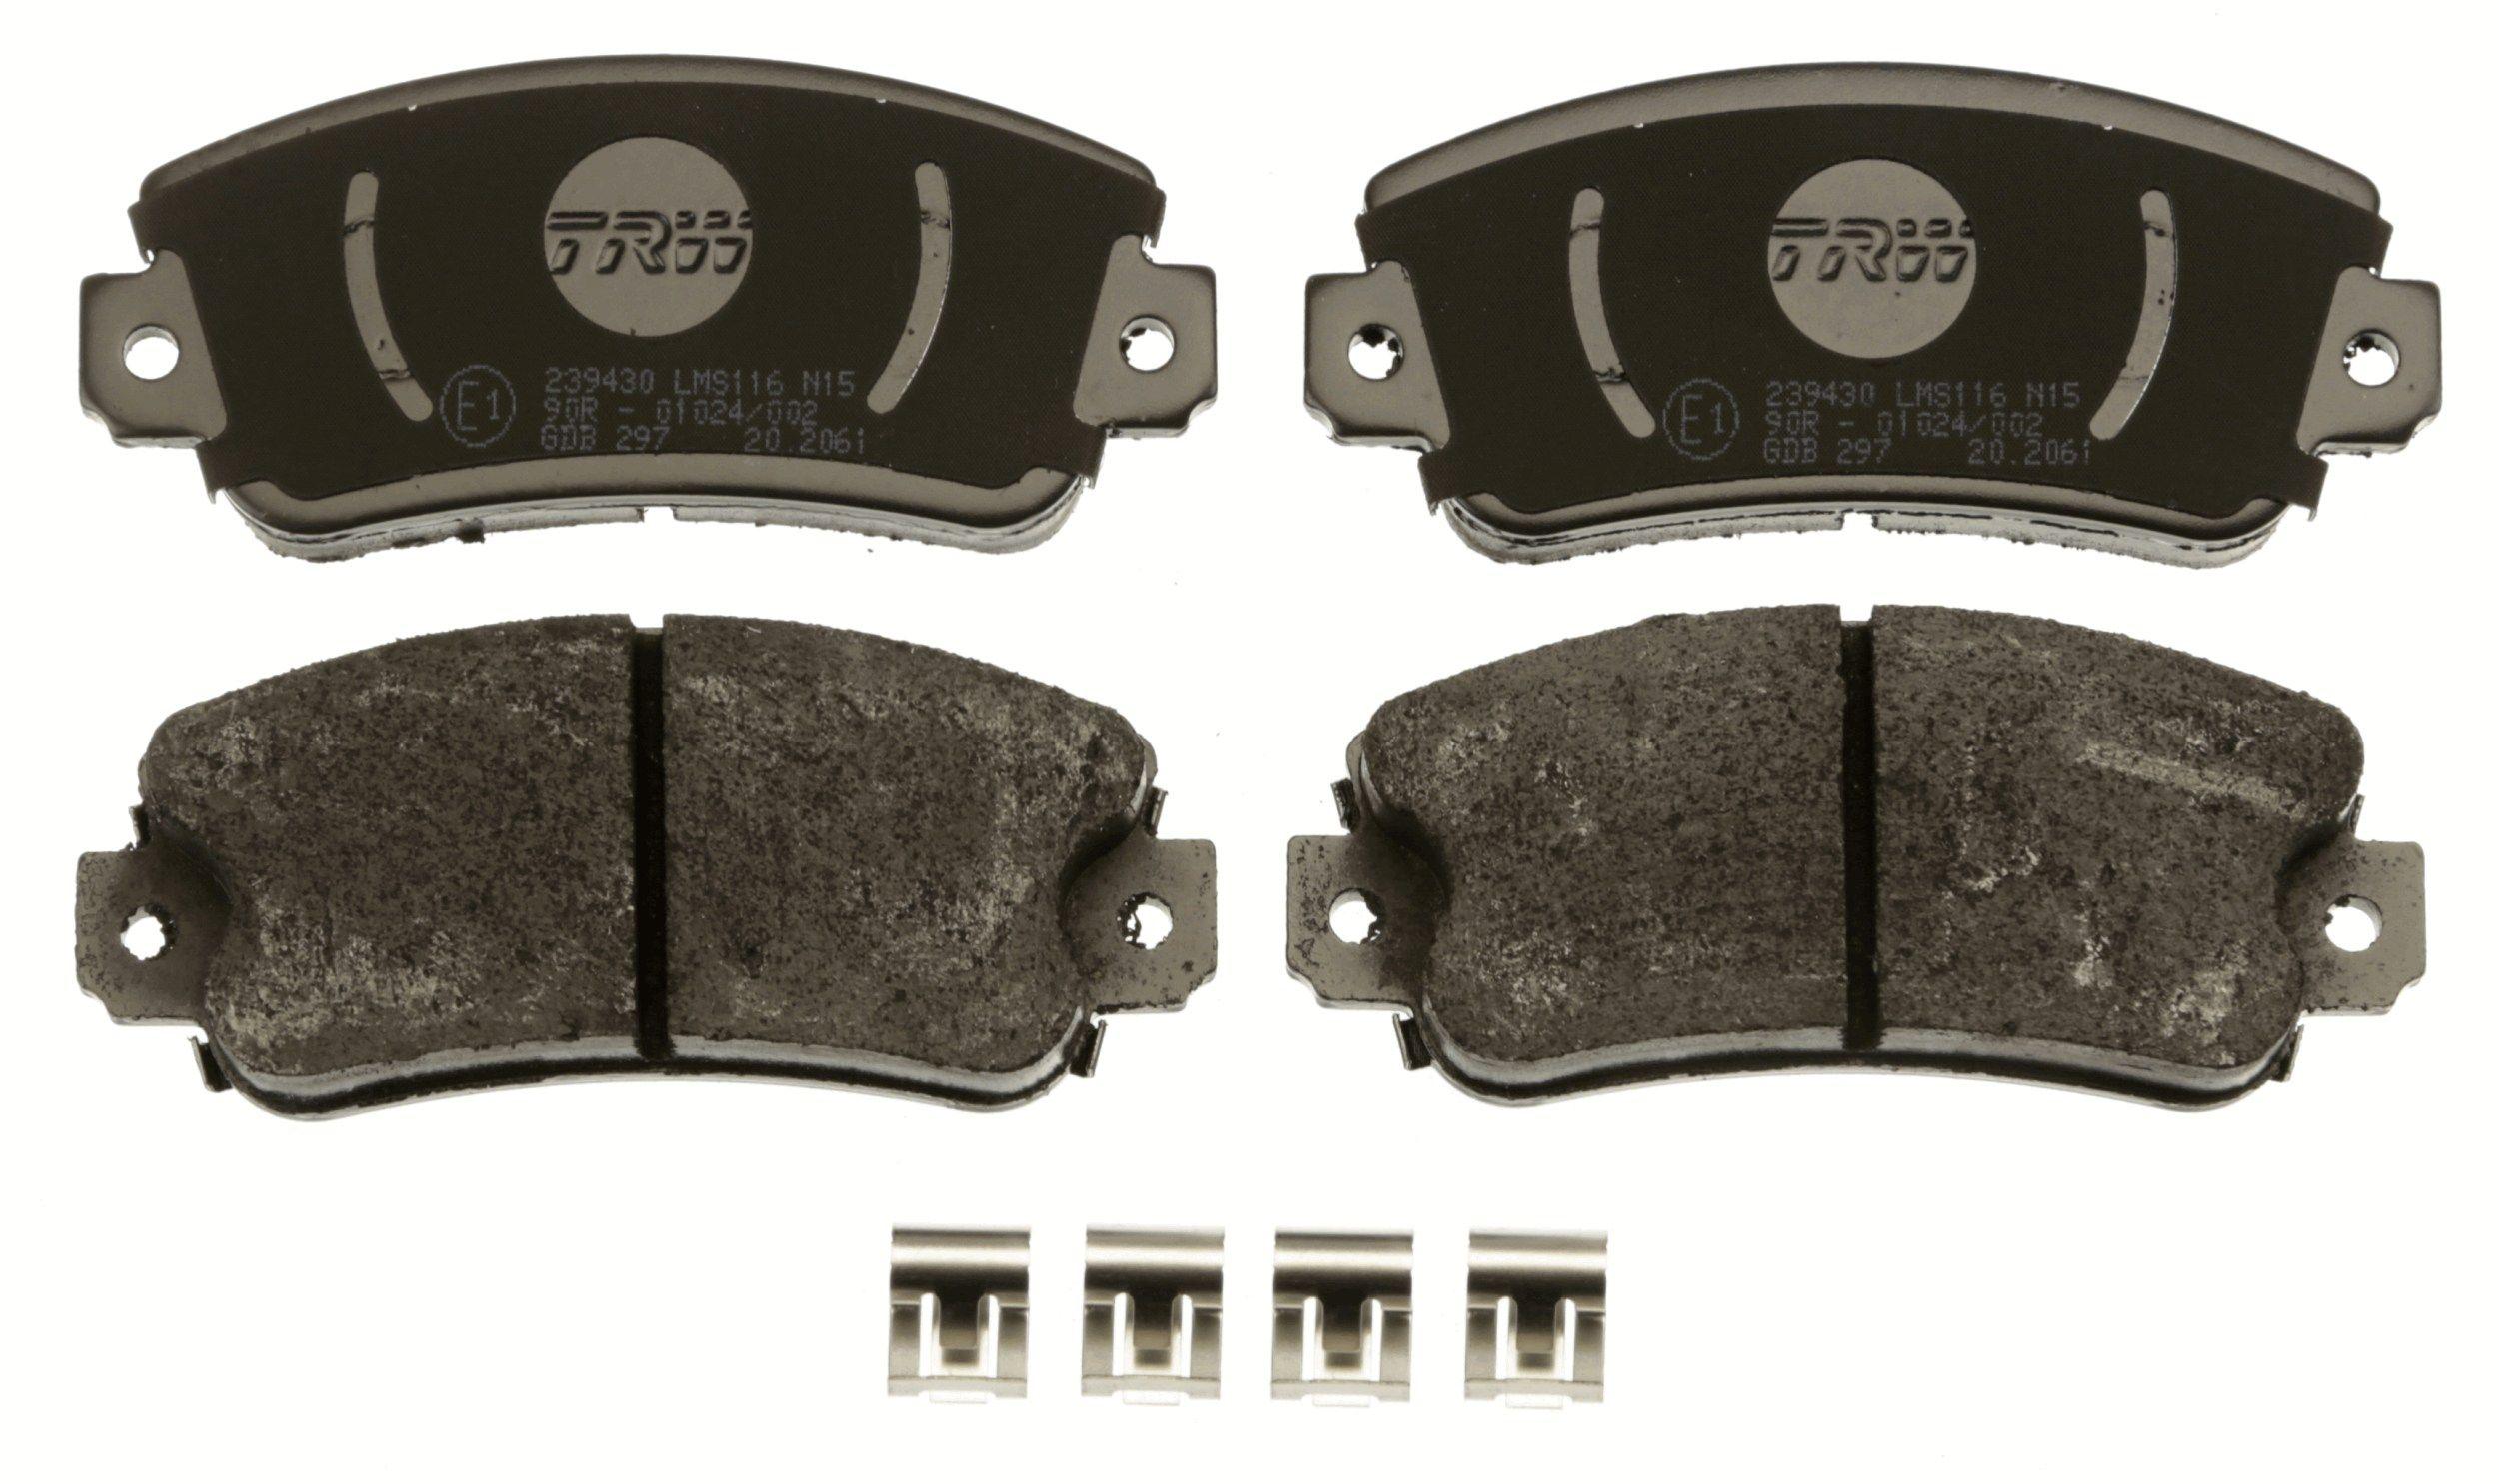 Bremsbelagsatz TRW 20951 Bewertung